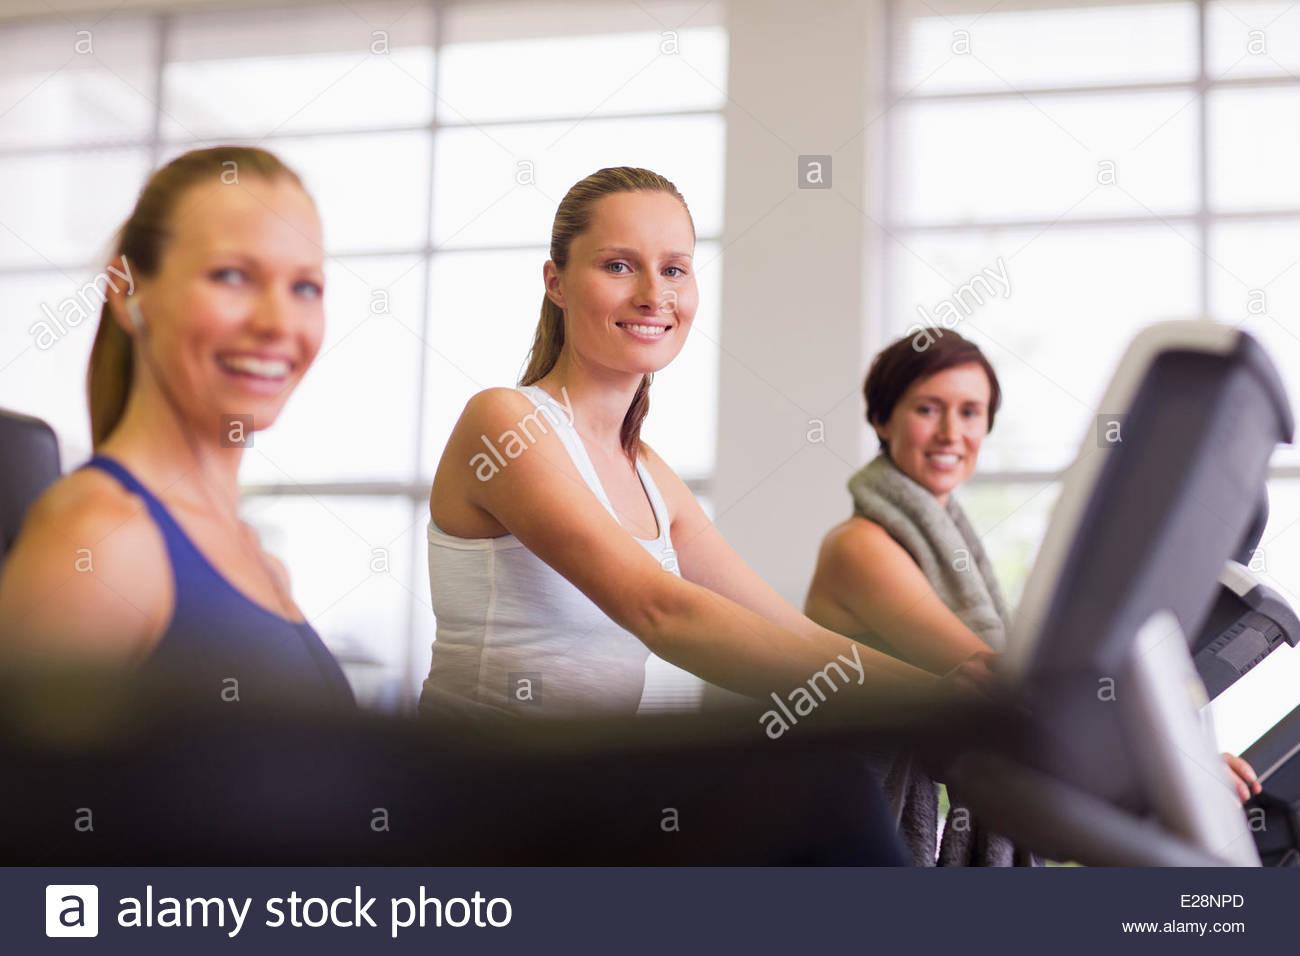 Porträt der lächelnde Frau am Heimtrainer im gymnasium Stockbild